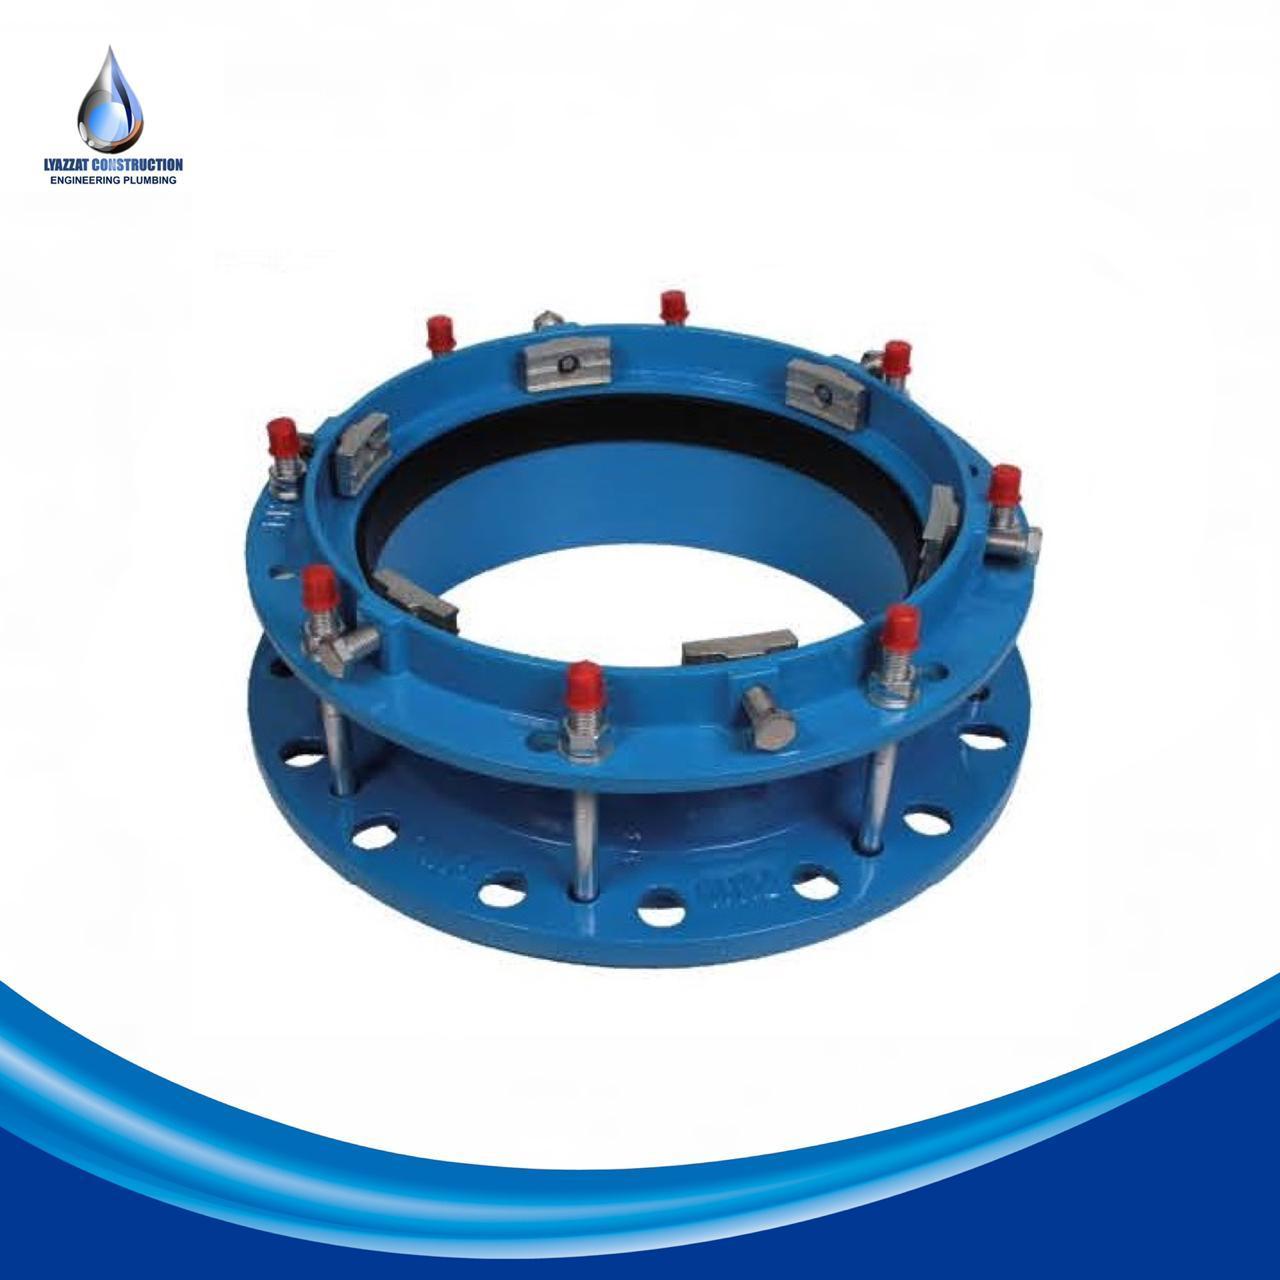 Фланец фиксирующий для ПЭ и ПВХ труб DN 600/630 PN10-16